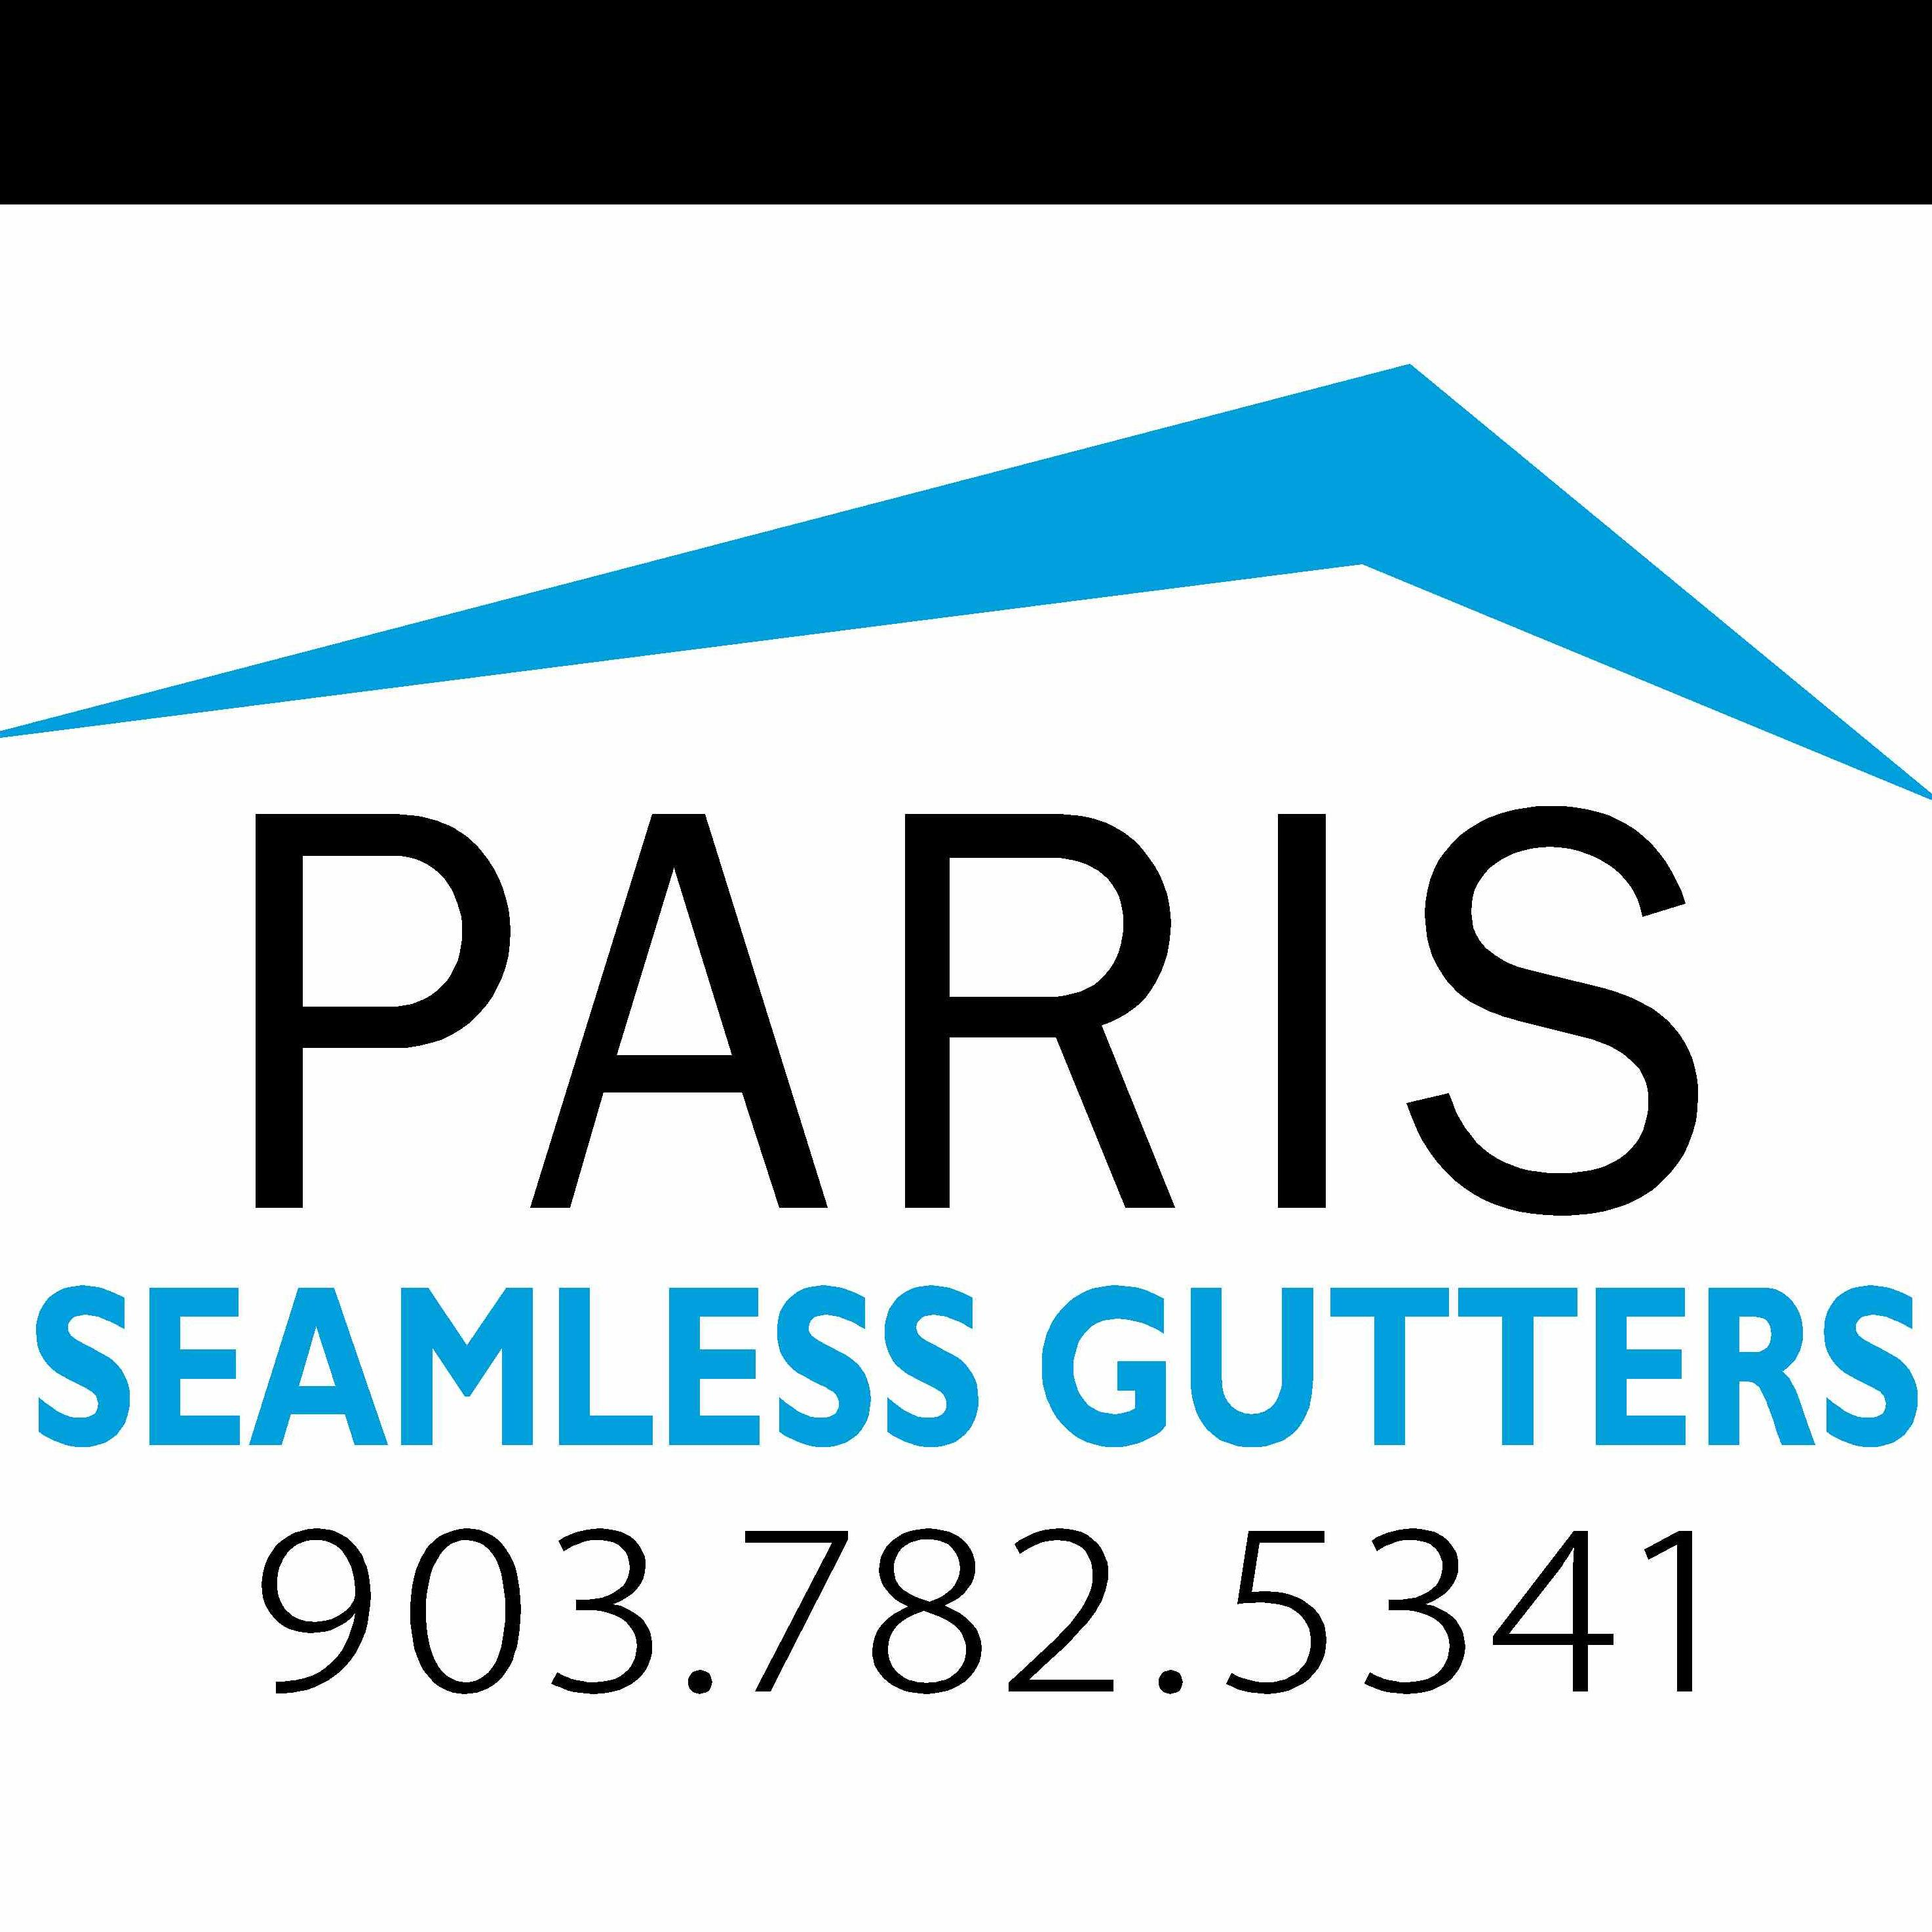 Paris Seamless Gutters image 0